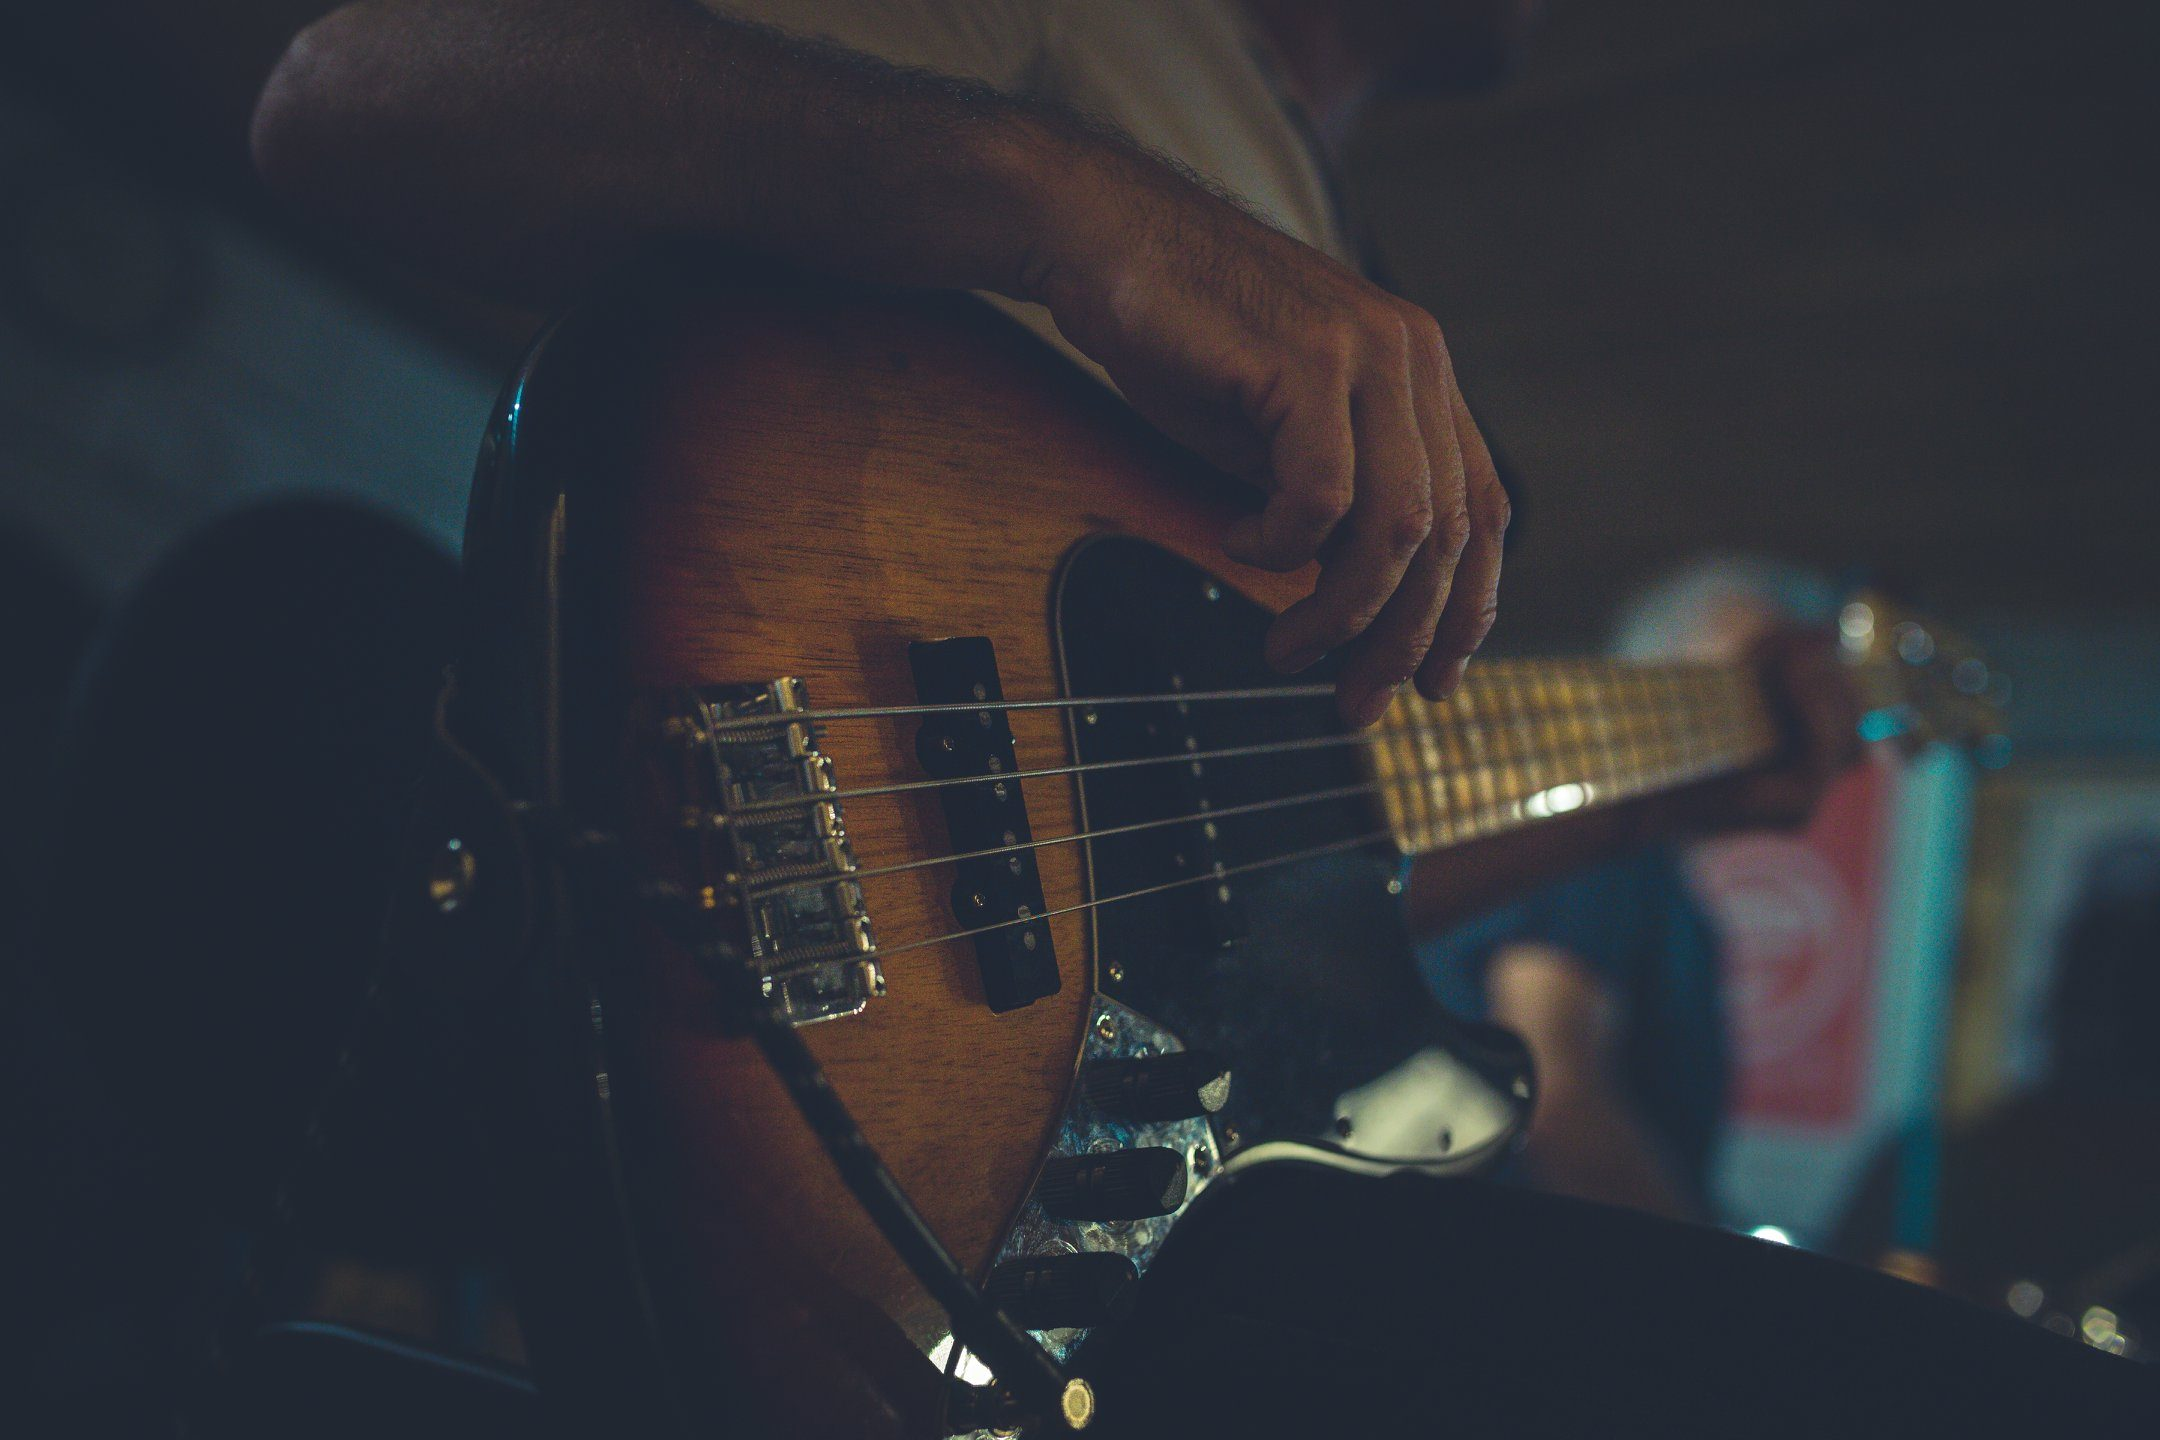 blackpool bass